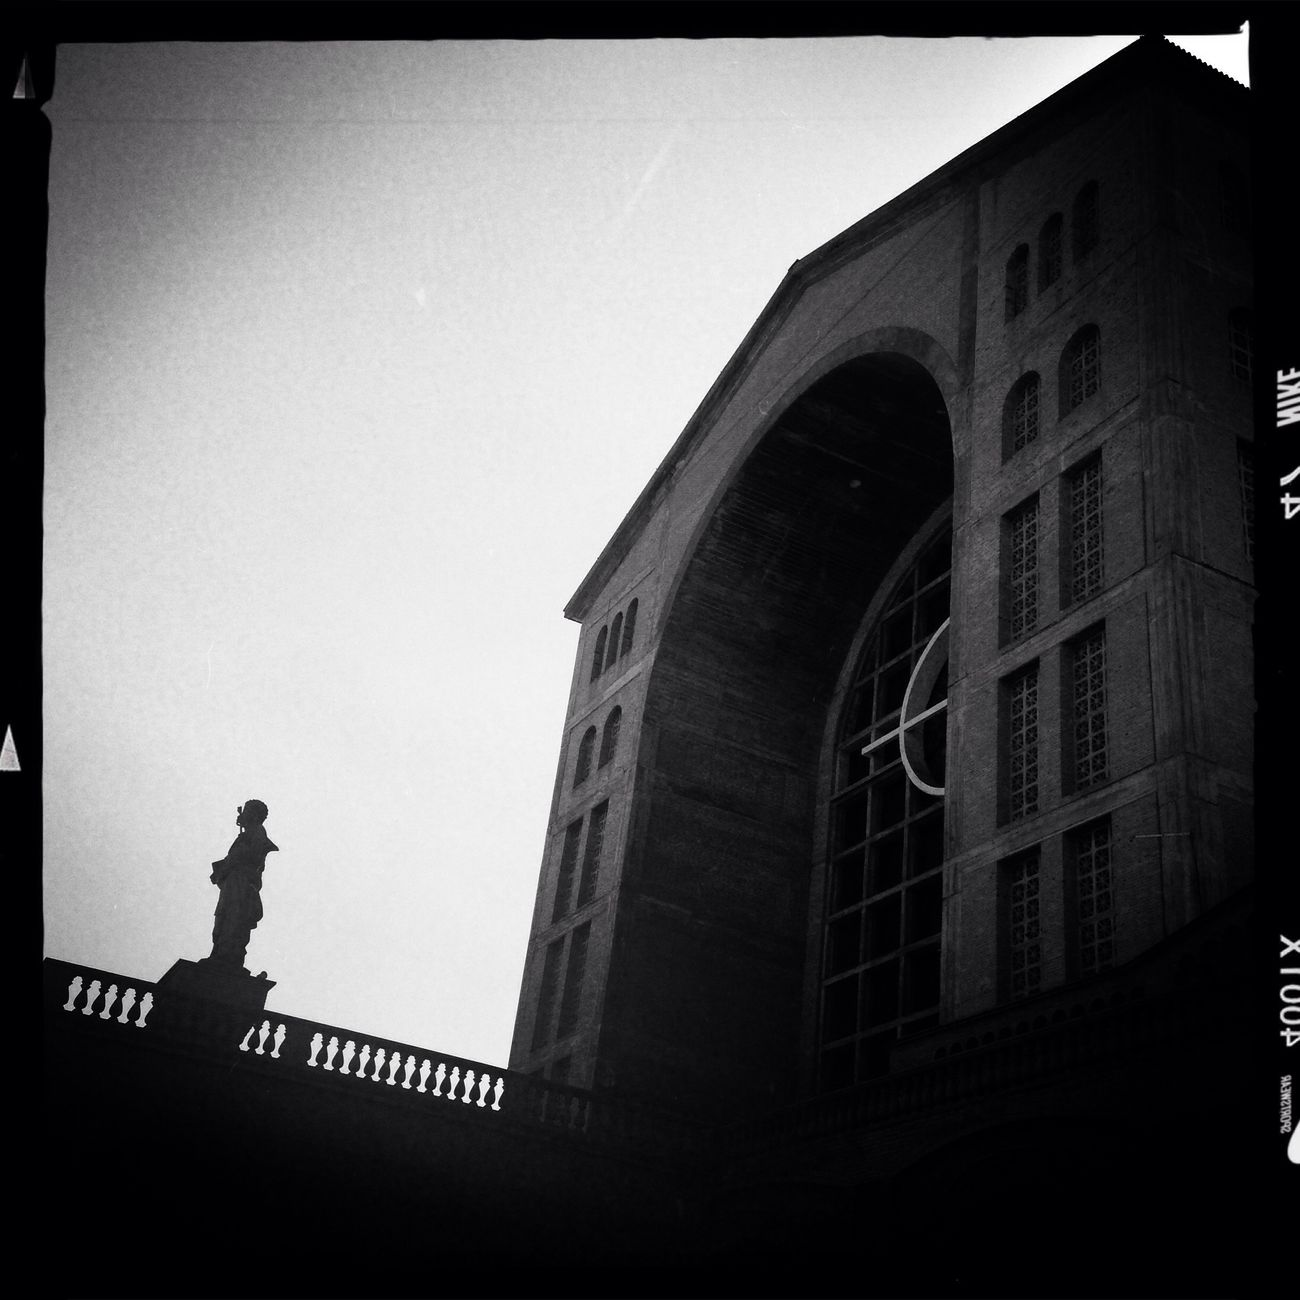 Hipstamatic Monochrome Blackandwhite Statue Architecture Church